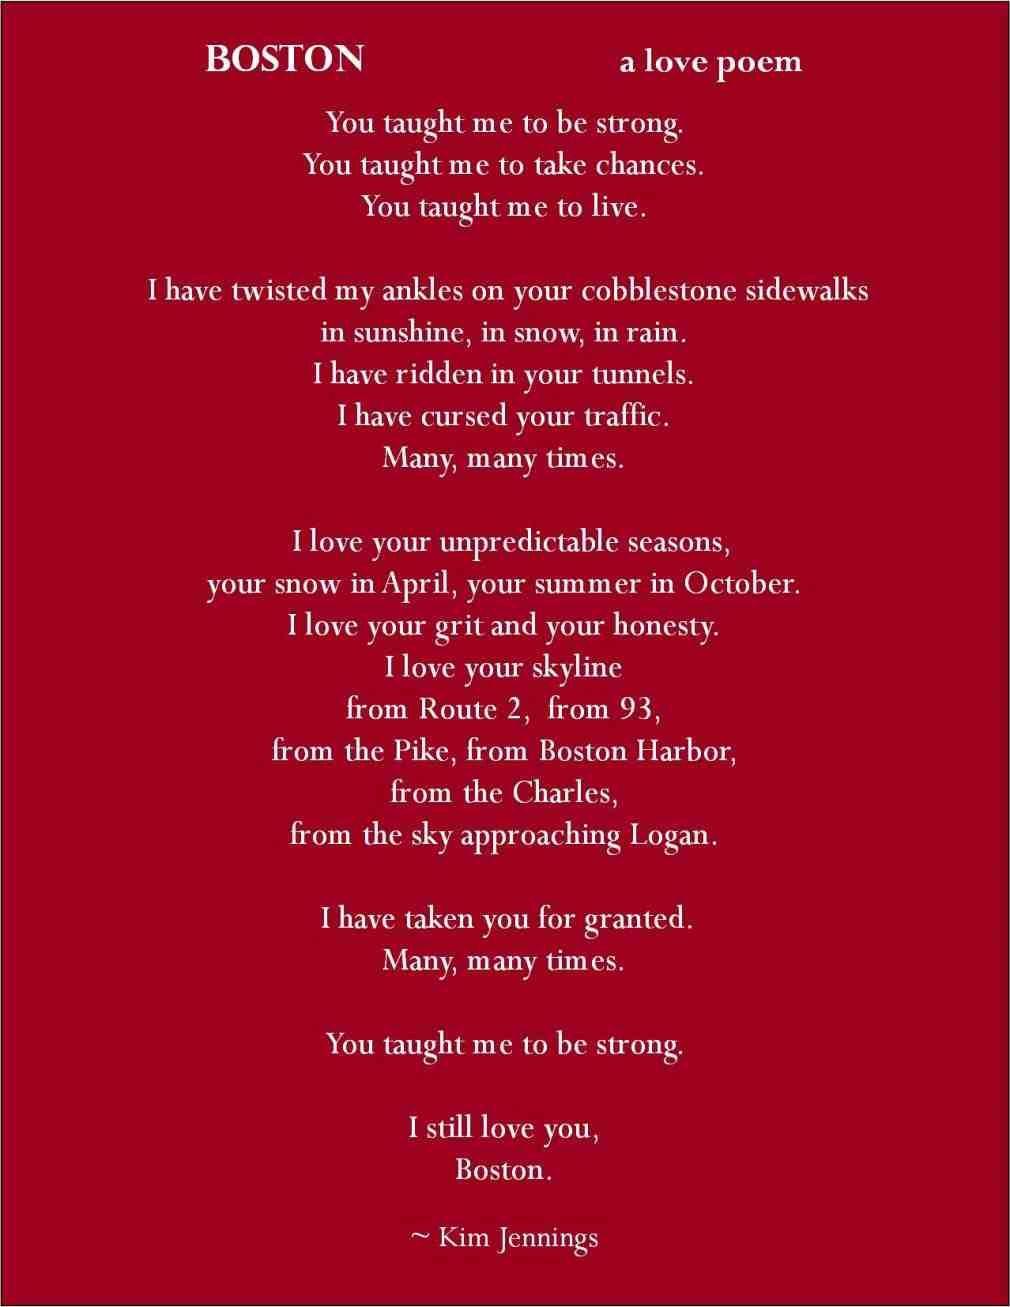 Best love poem websites